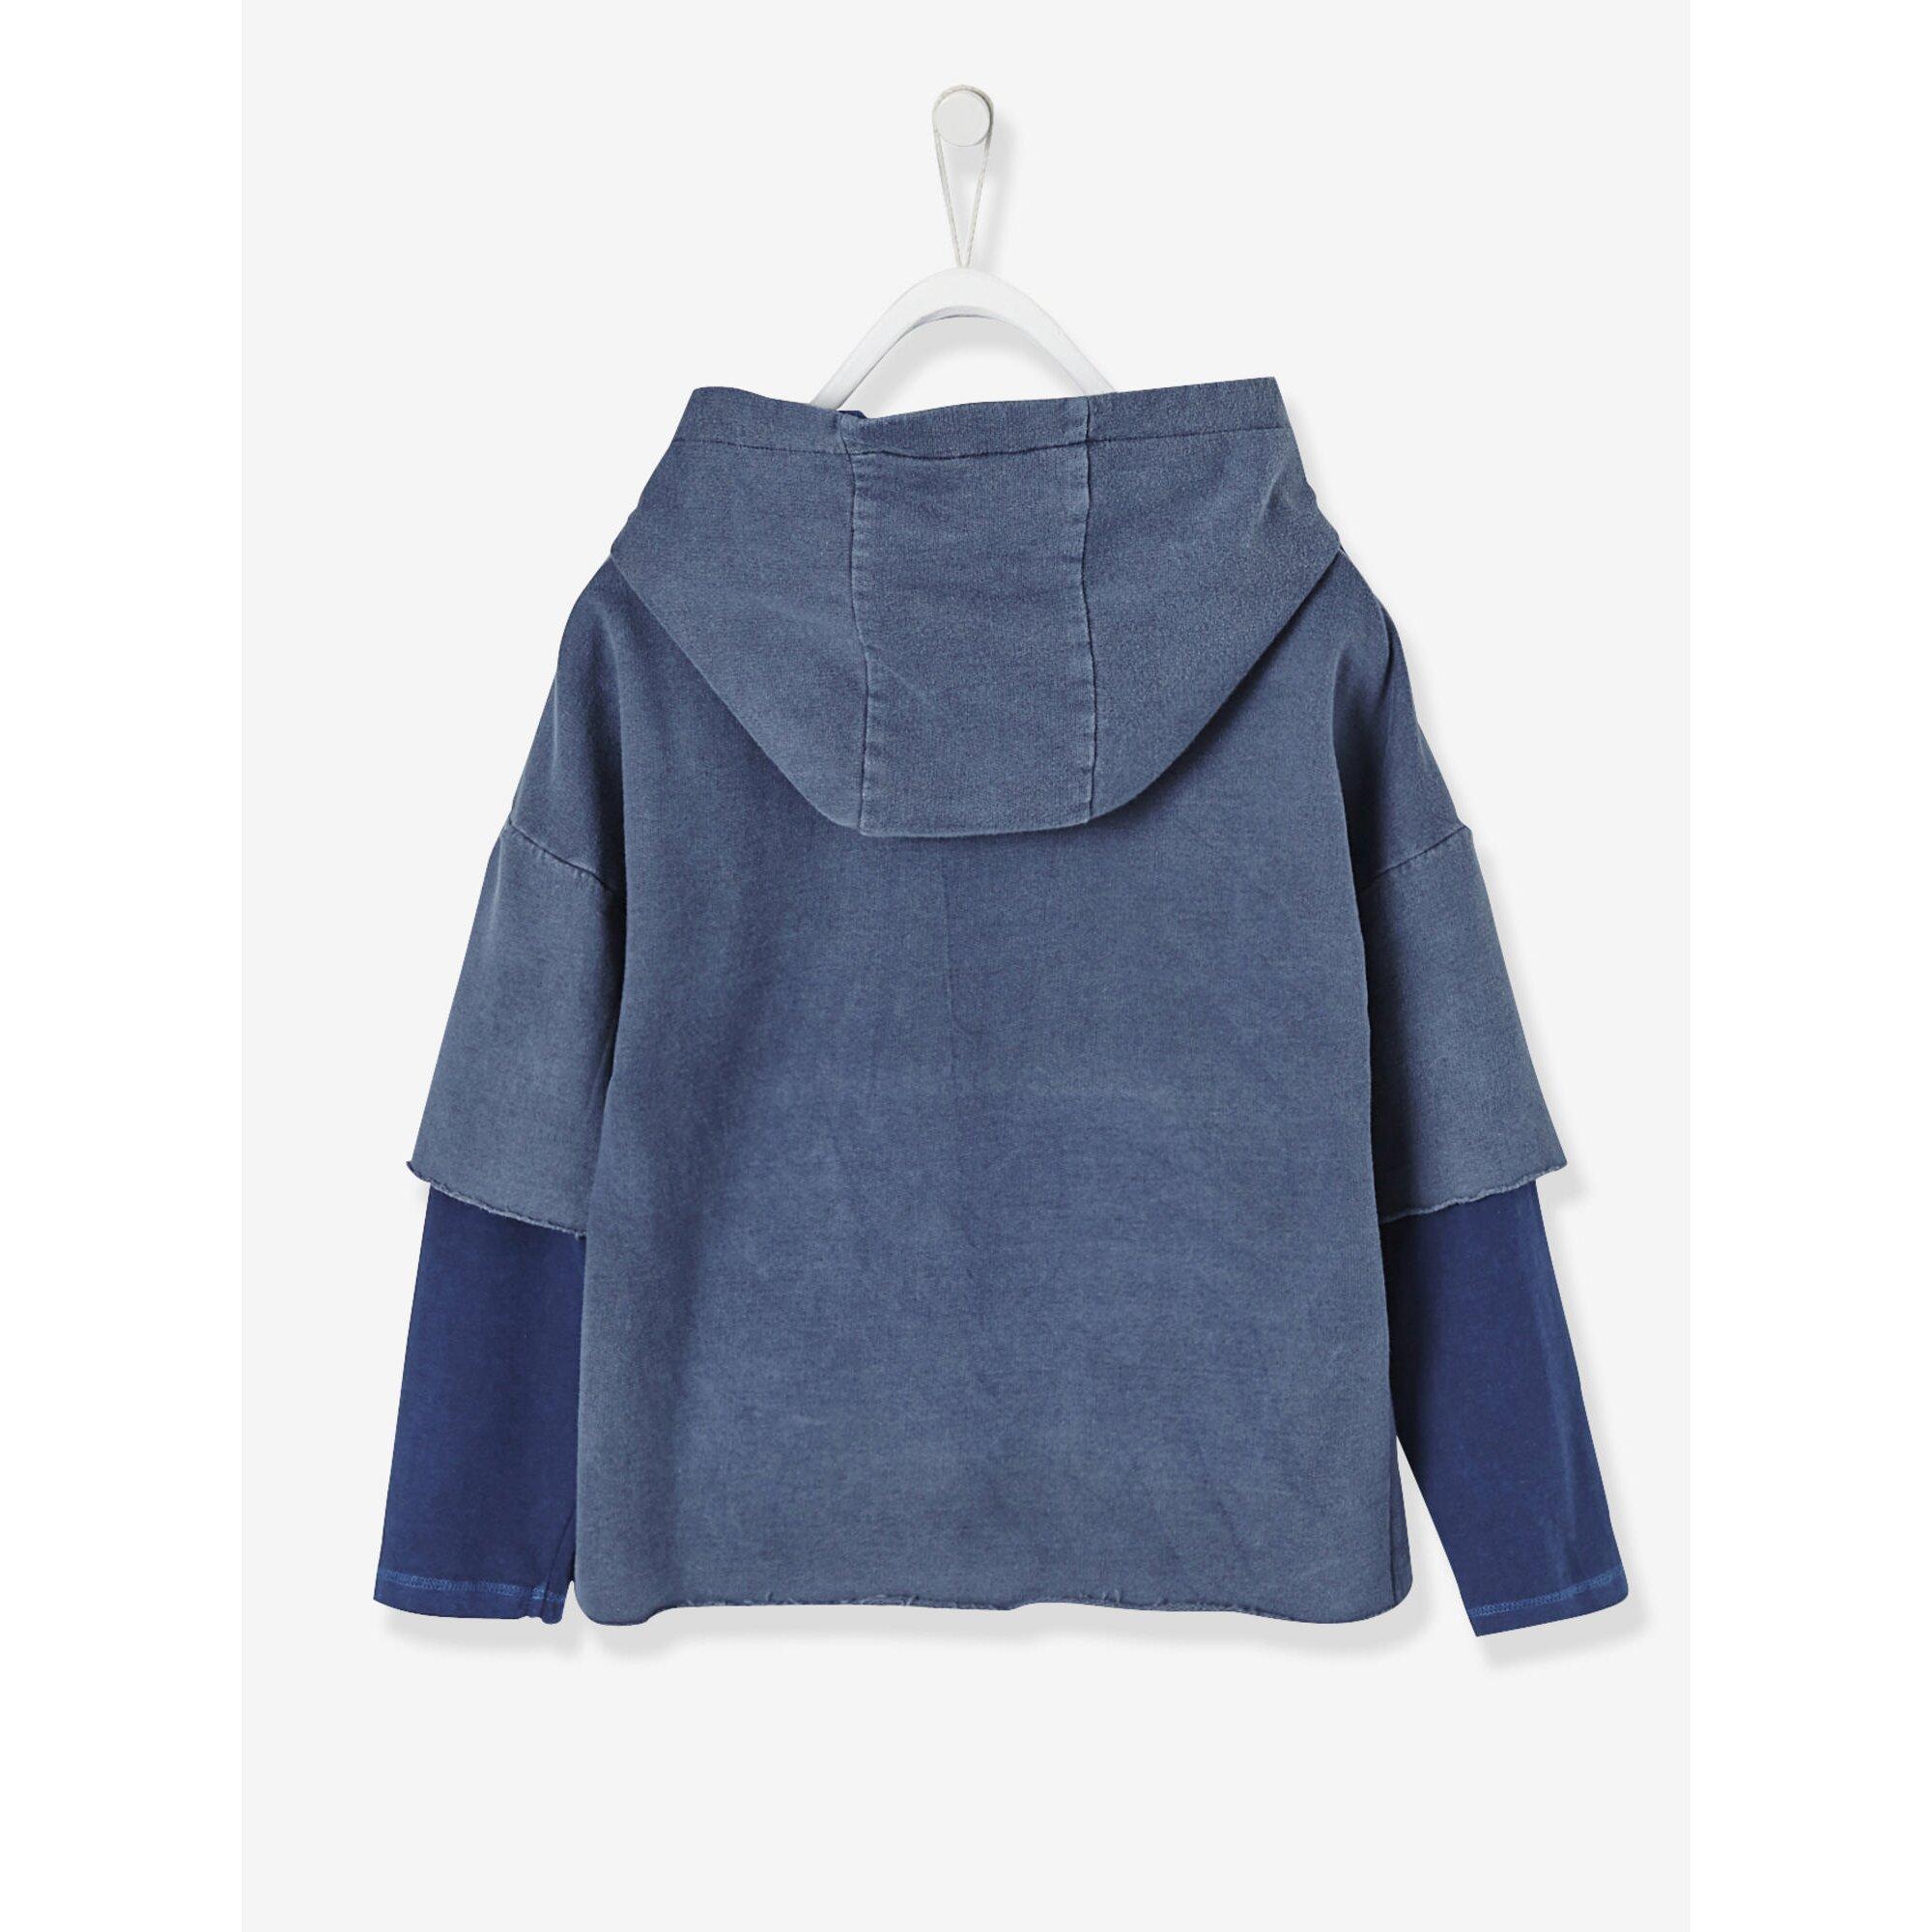 vertbaudet-jungen-kapuzensweatshirt-lageneffekt, 18.99 EUR @ babywalz-de